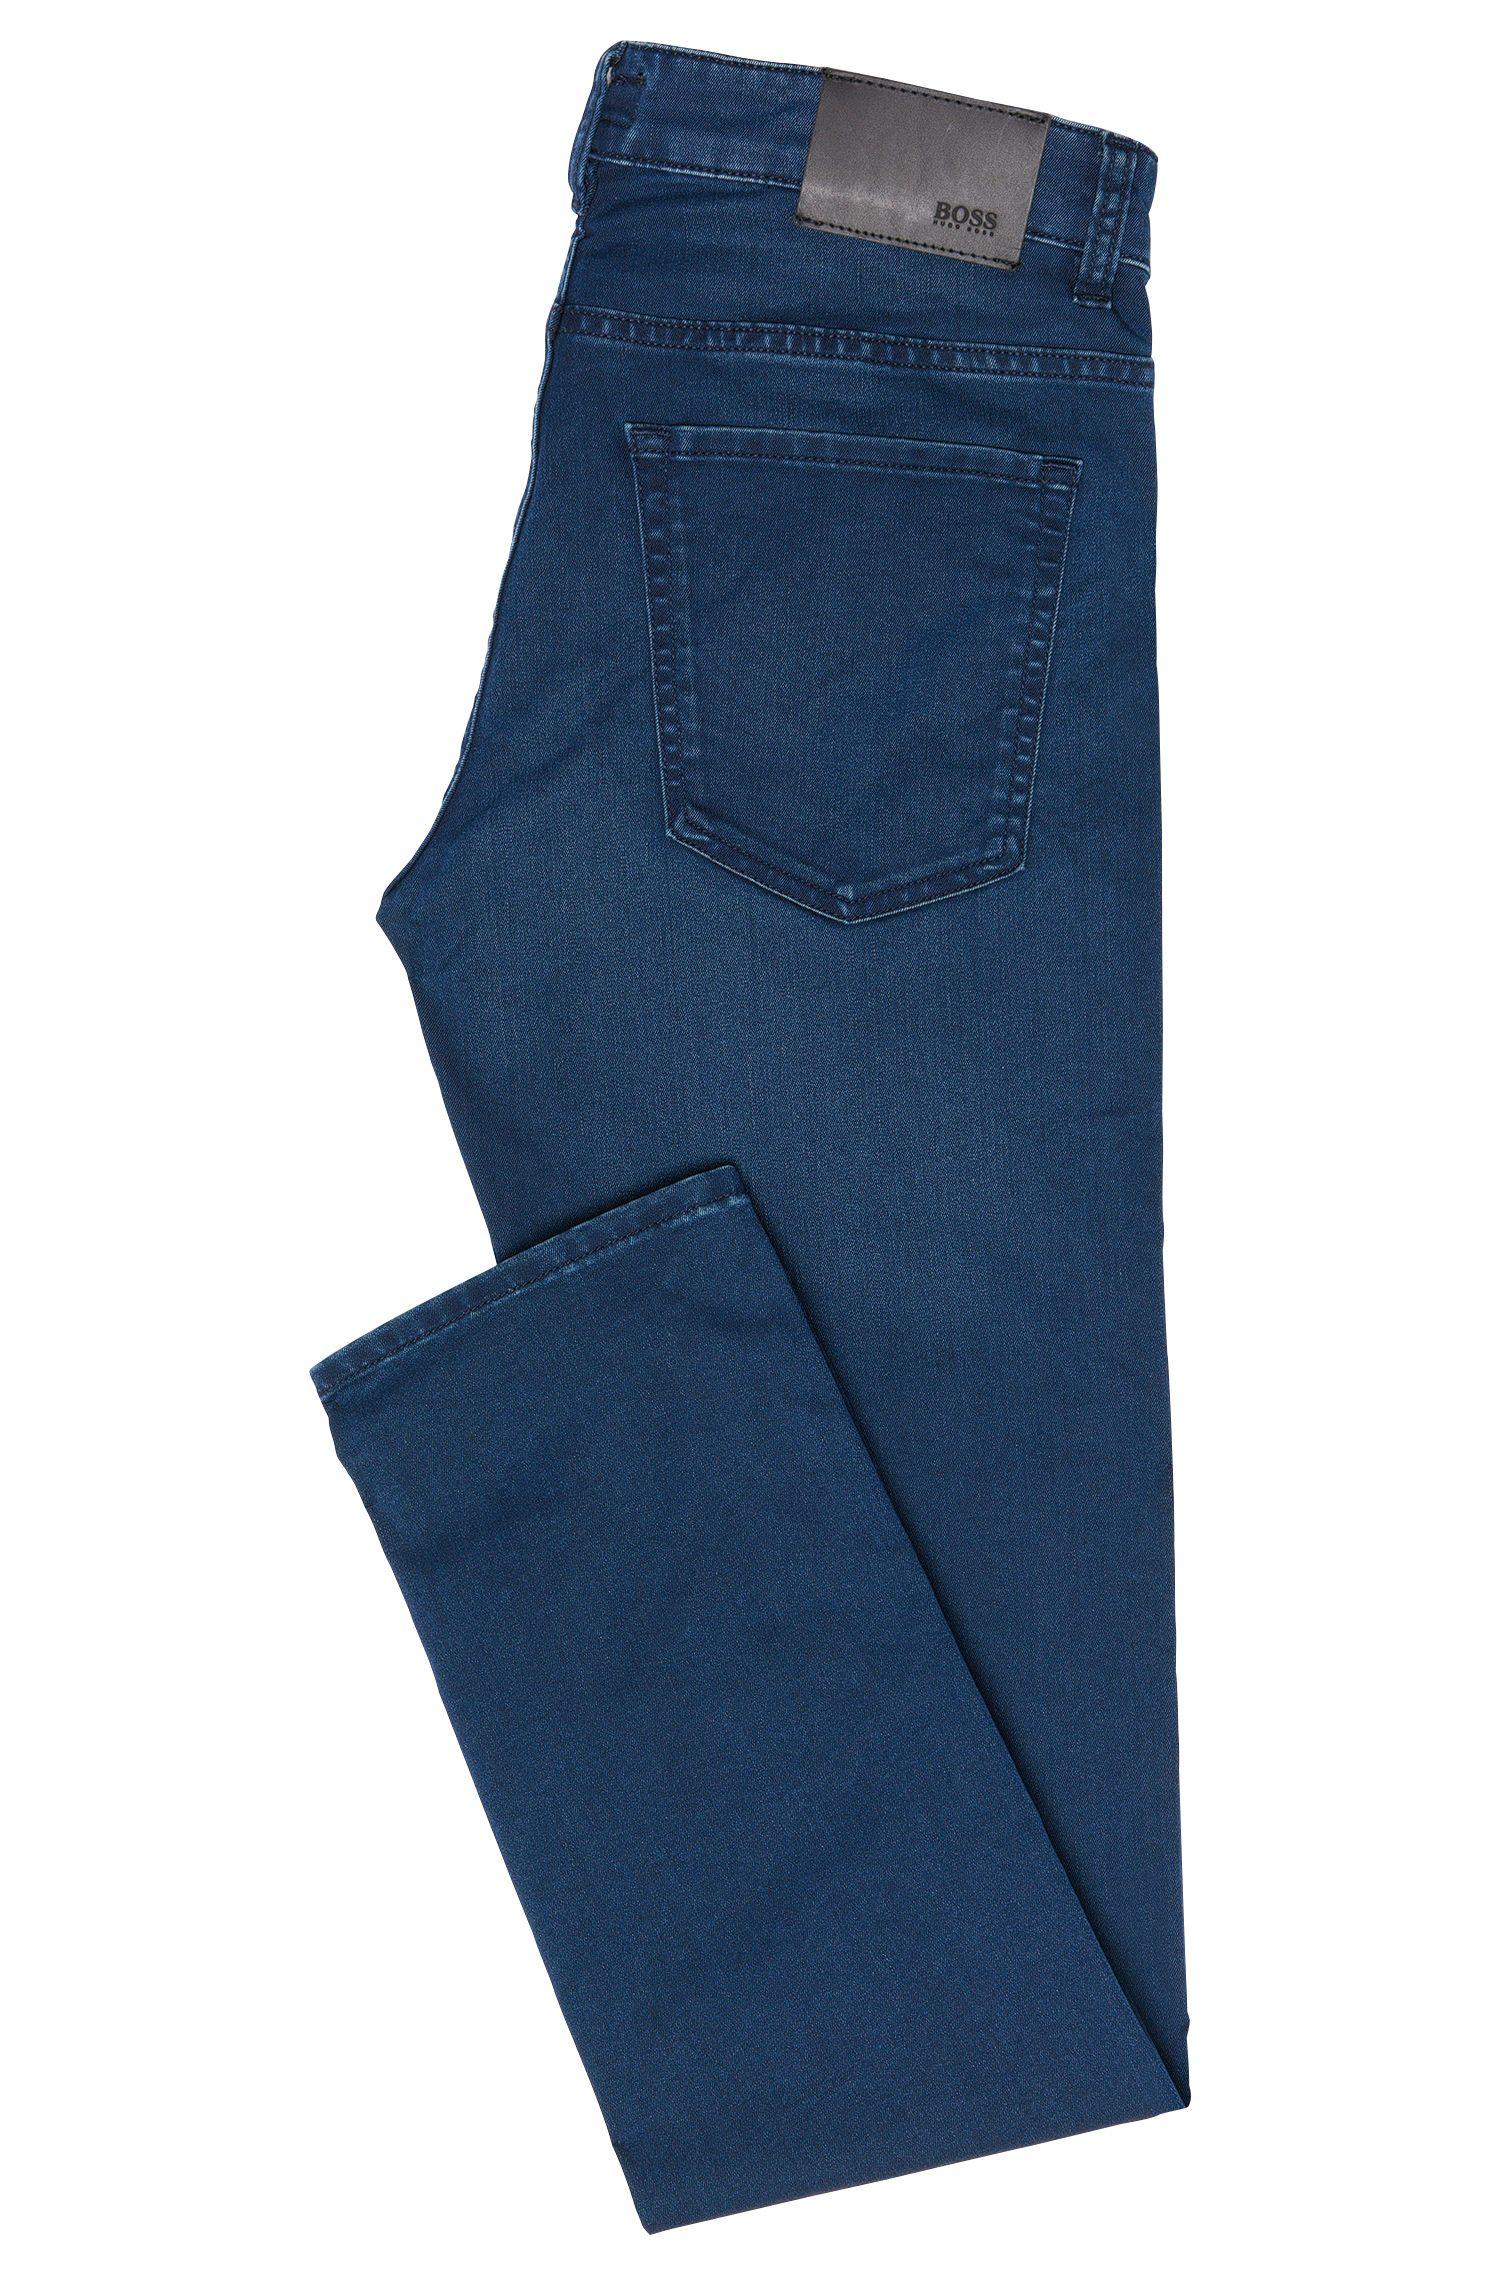 Slim-Fit Jeans aus Baumwoll-Mix mit Used-Waschung: 'Delaware3'